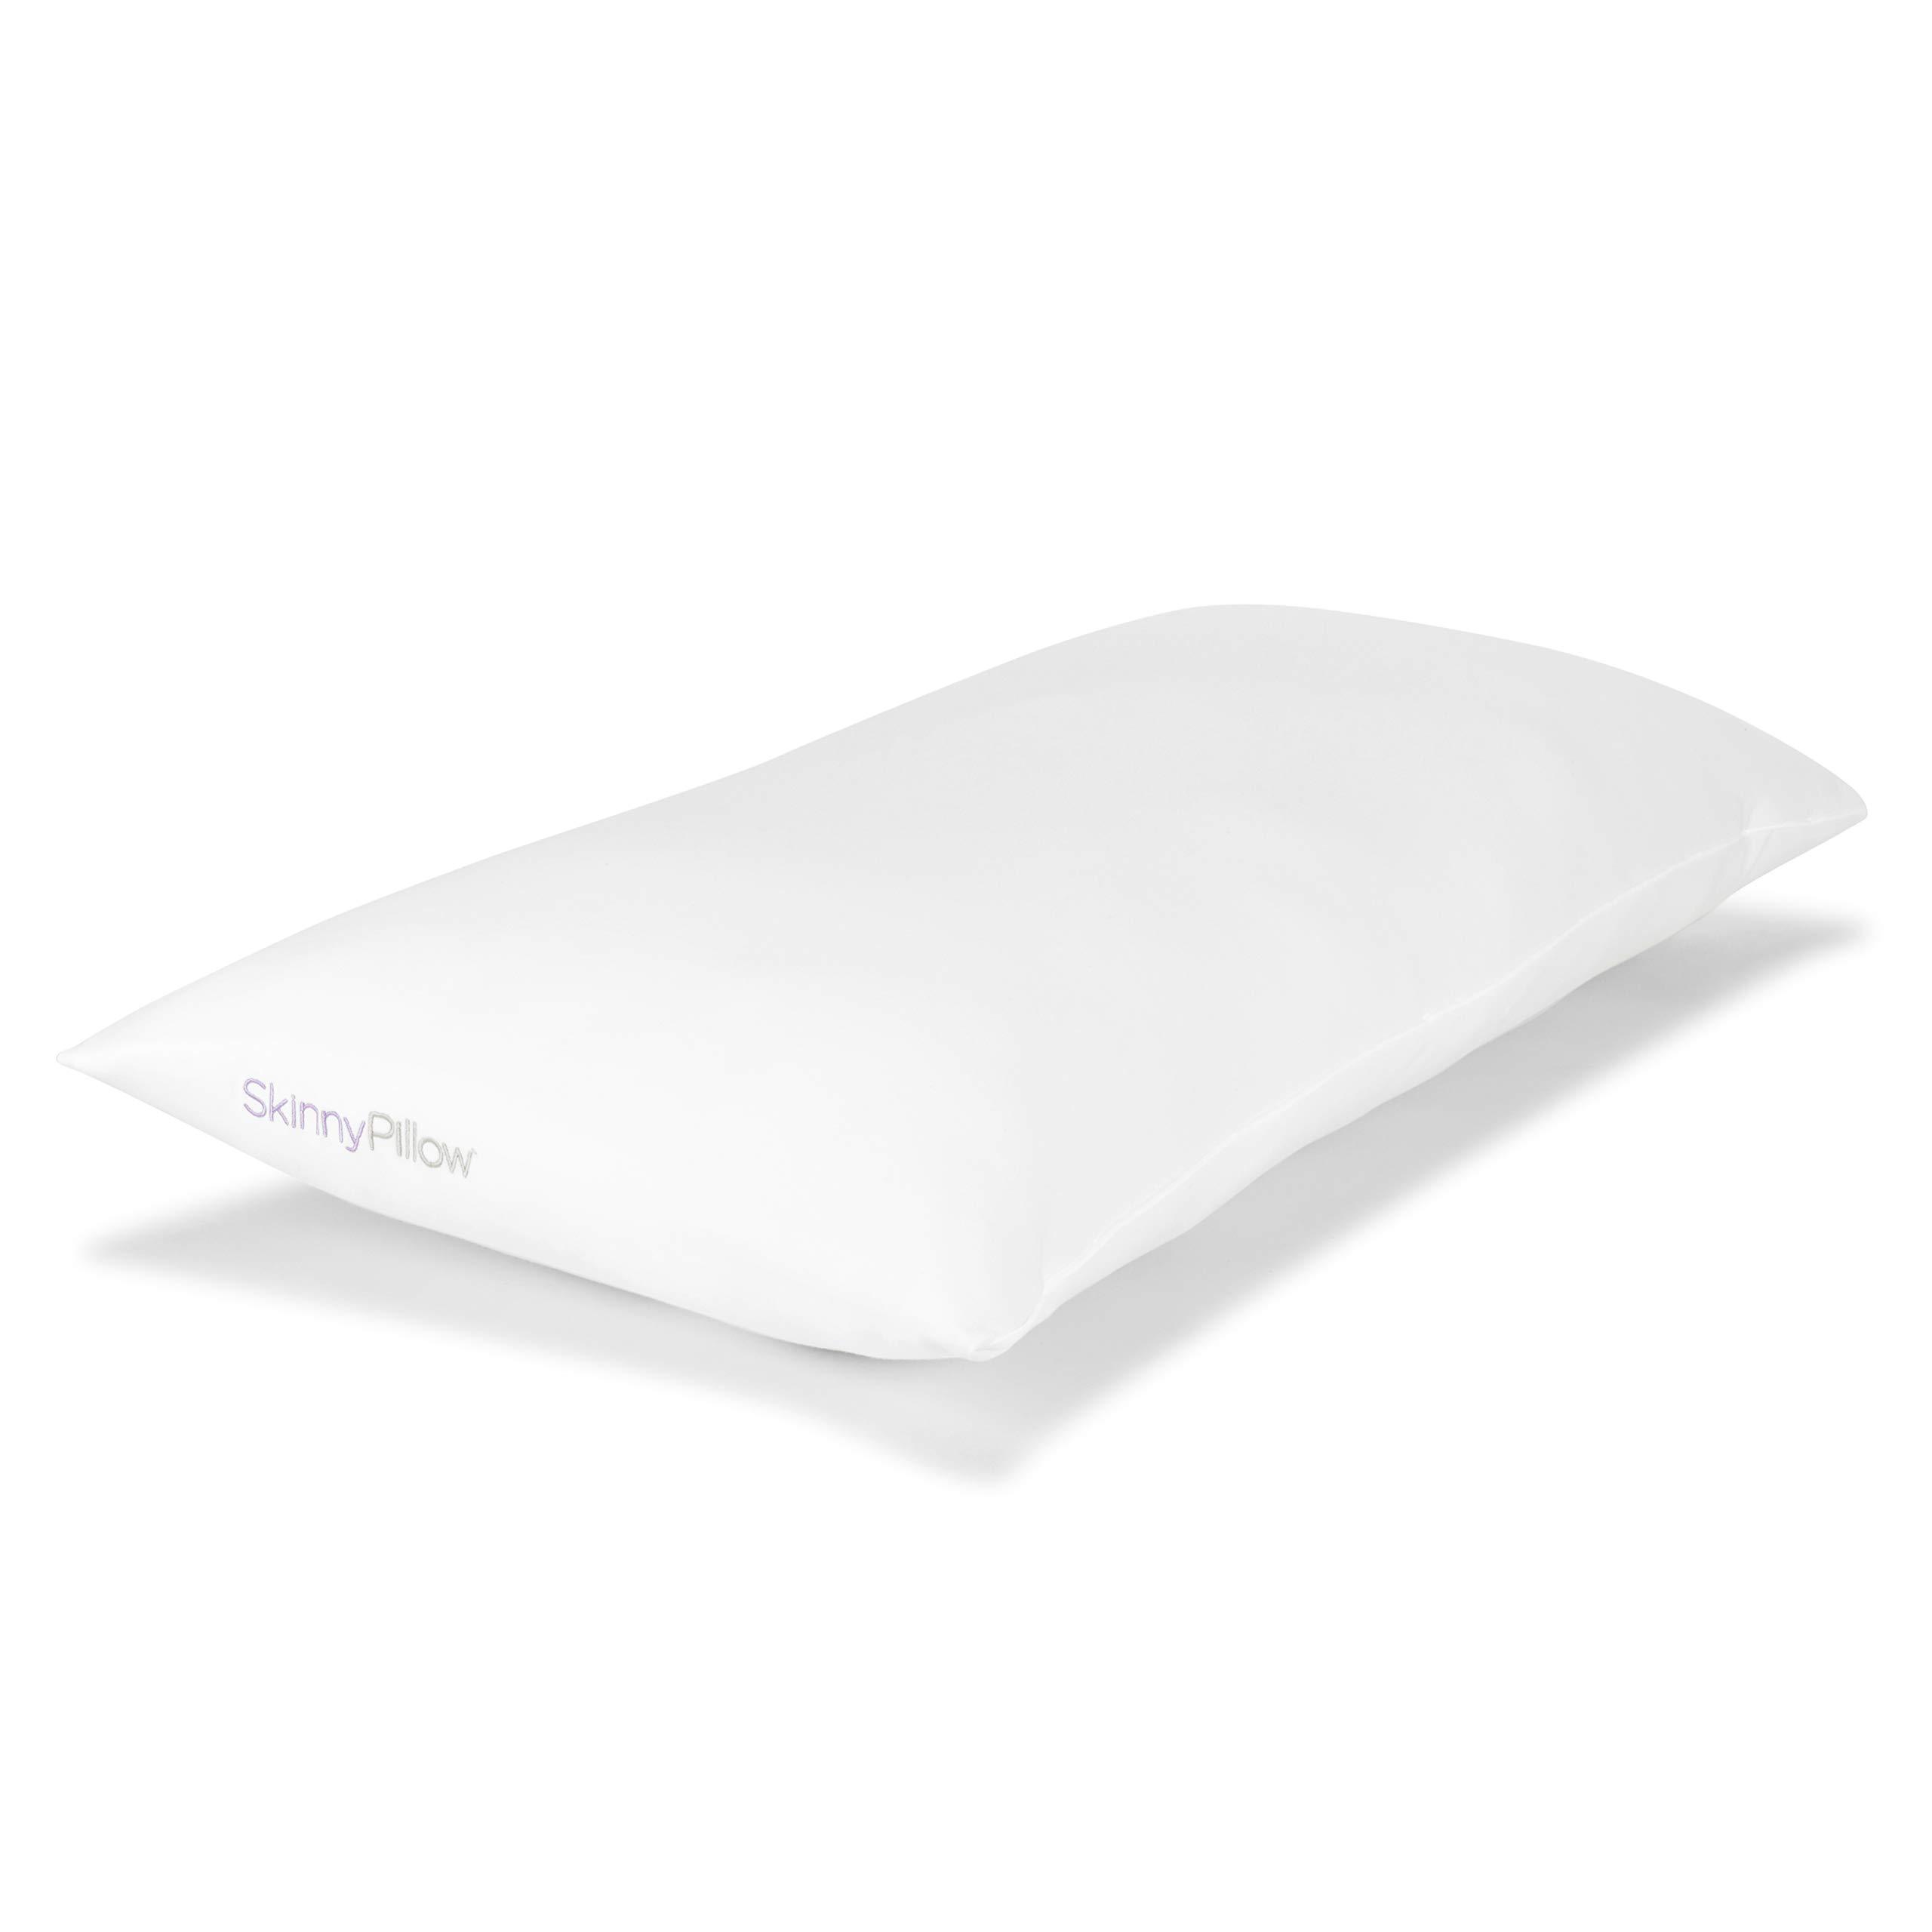 SkinnyPillow   Organic Kapok Pillows for Sleeping (King, Soft)   Handmade, Non-Toxic, Eco-Friendly   Natural Cotton Cover   Organic Cotton Pillow Case